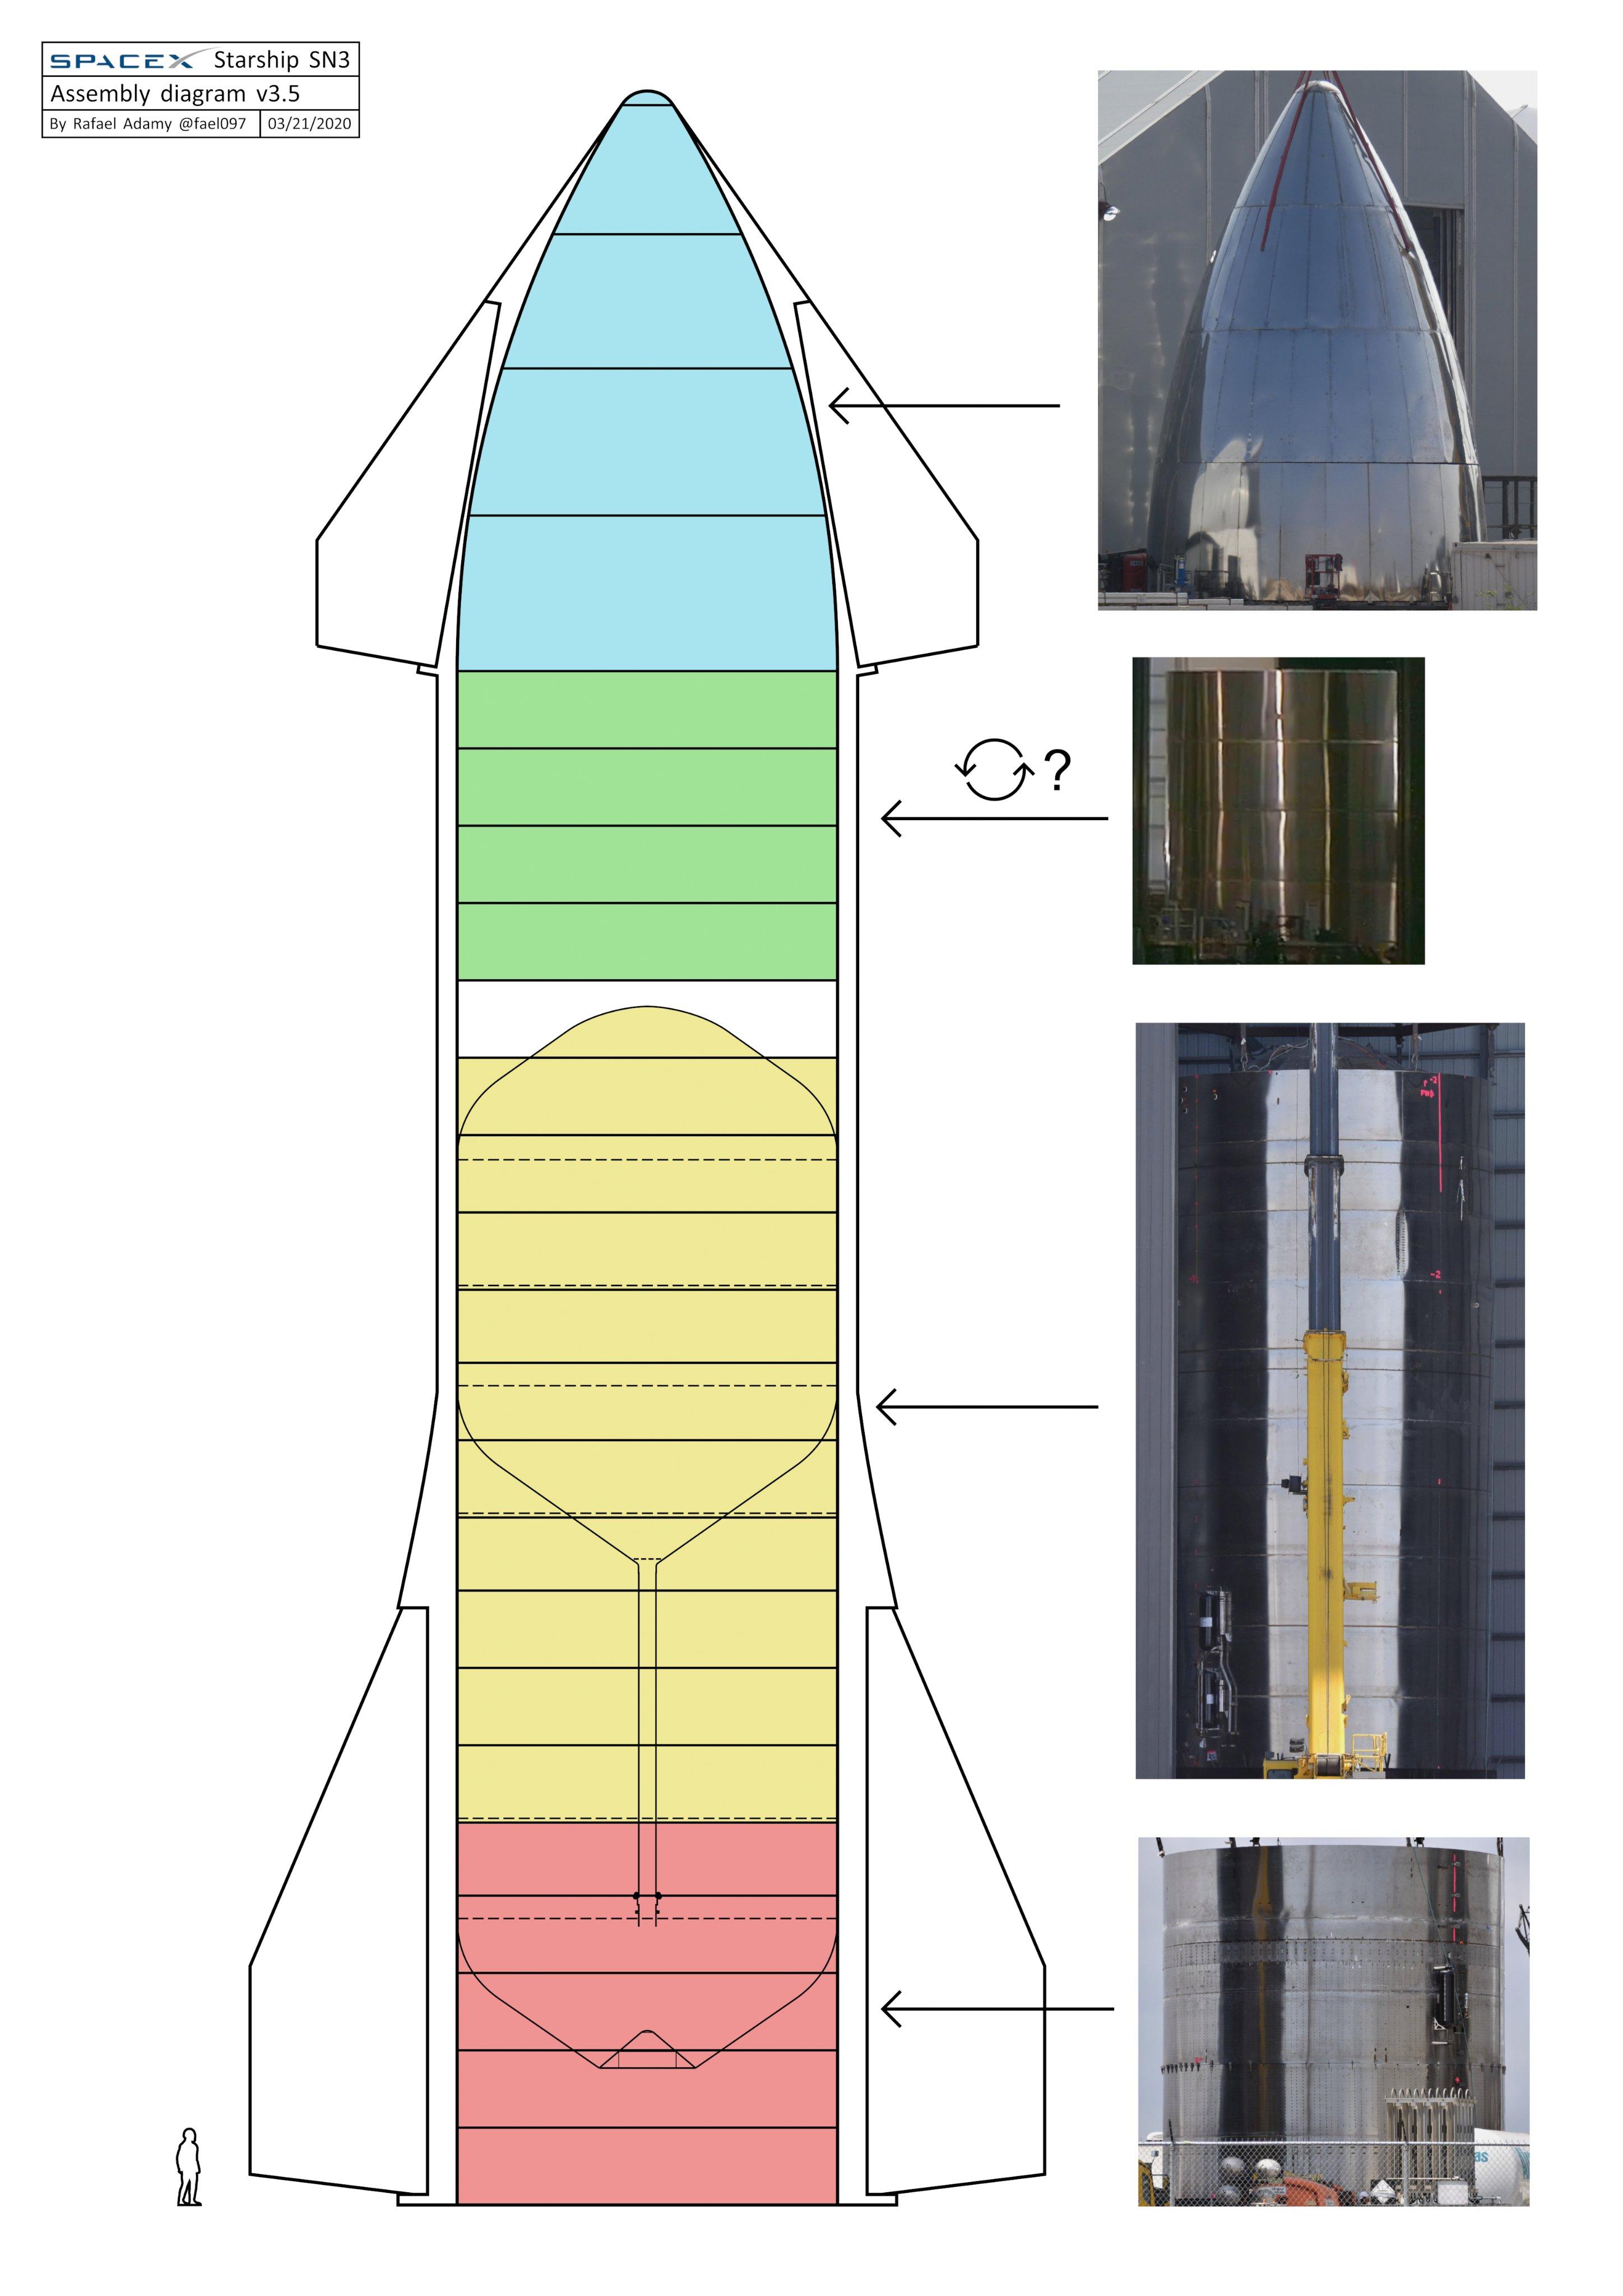 Starship SN3 (Boca Chica) [Echec] - Page 3 ETrcr4sWsAAJARS?format=jpg&name=4096x4096